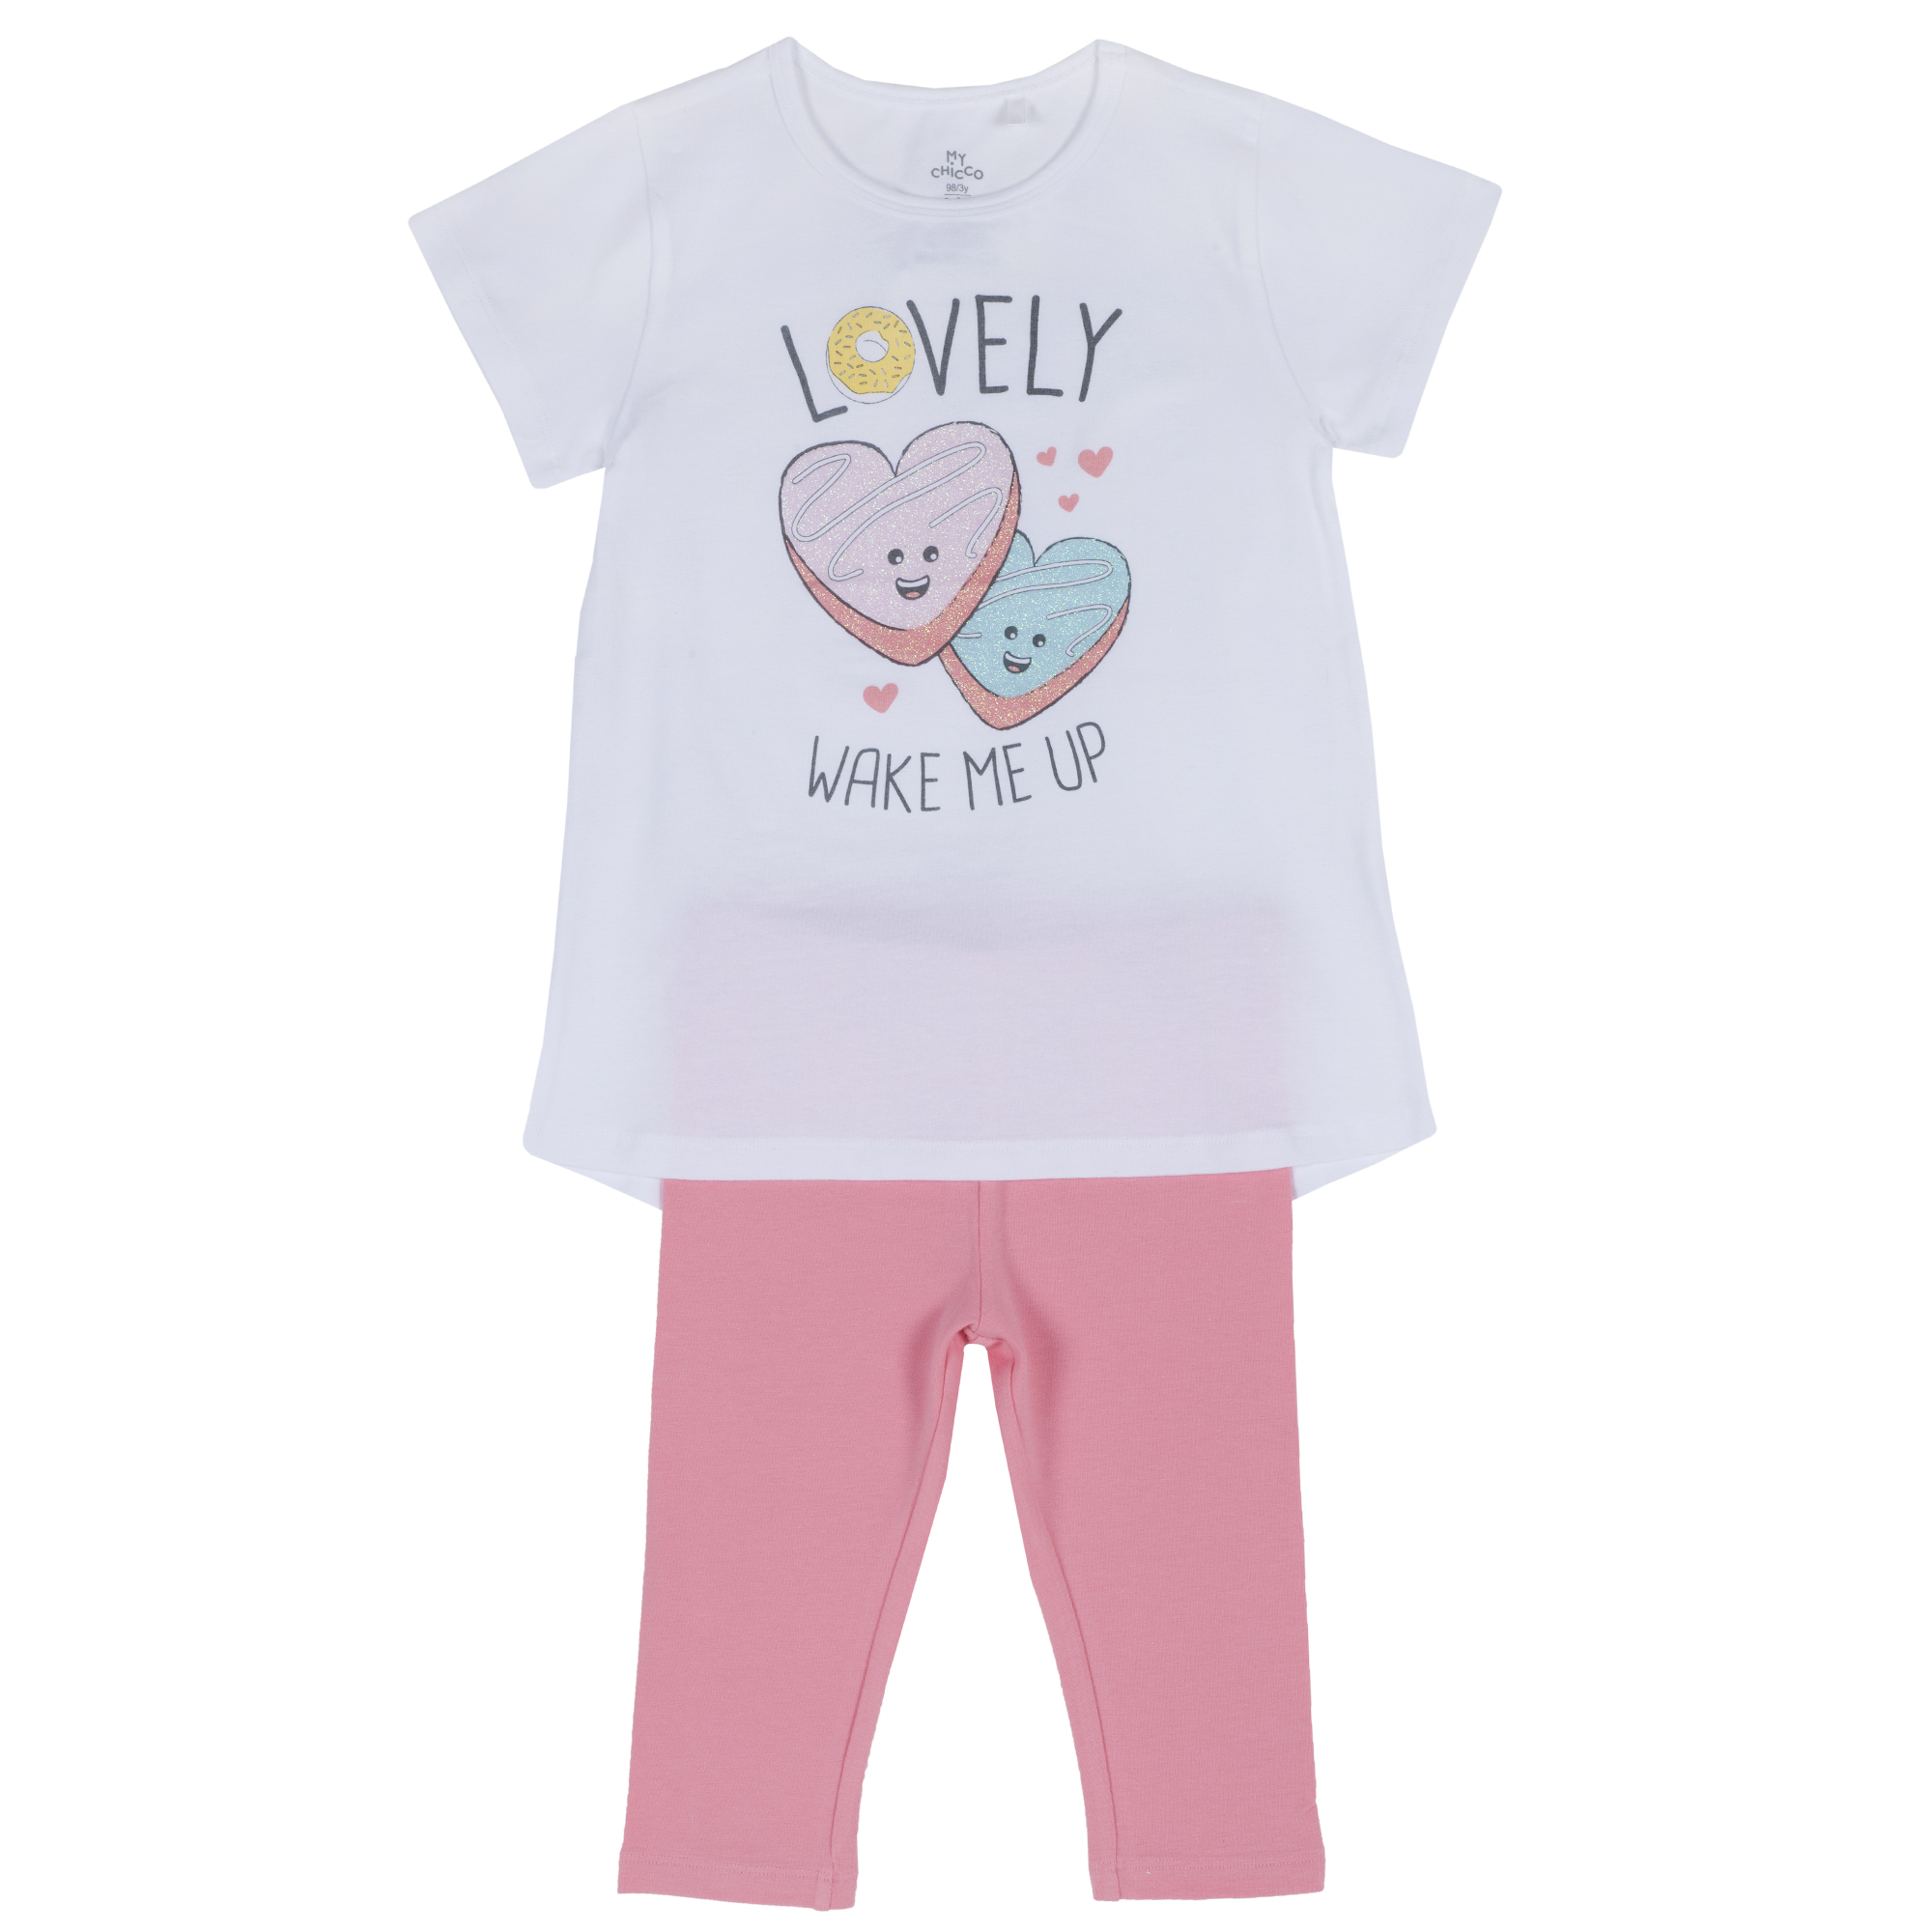 Pijama Copii Chicco, Tricou Si Pantalon, Roz Cu Alb, 35359 imagine